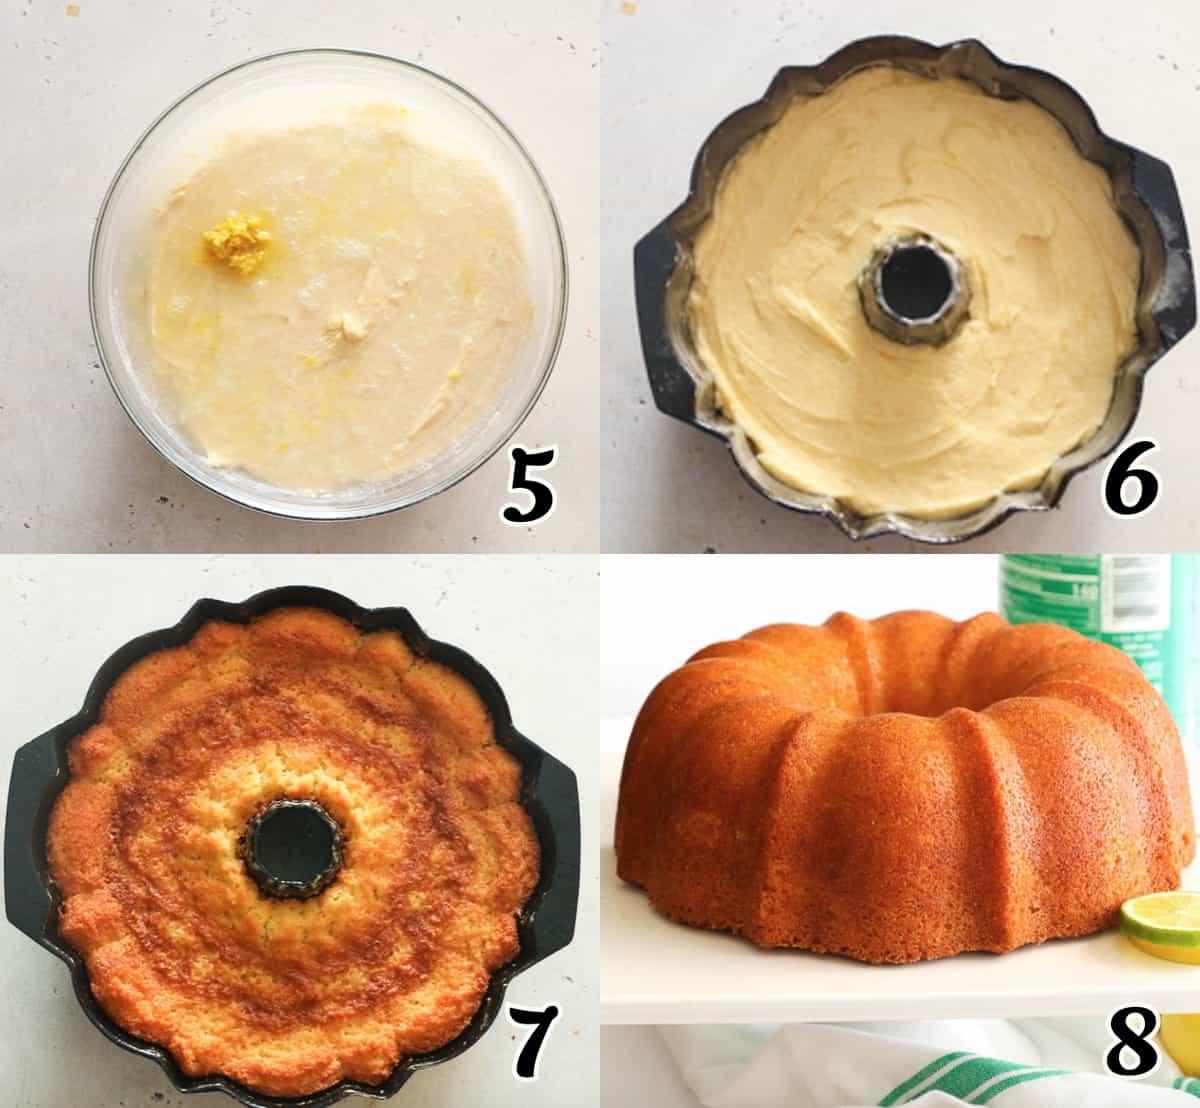 7UP Pound Cake Instructions 5-8